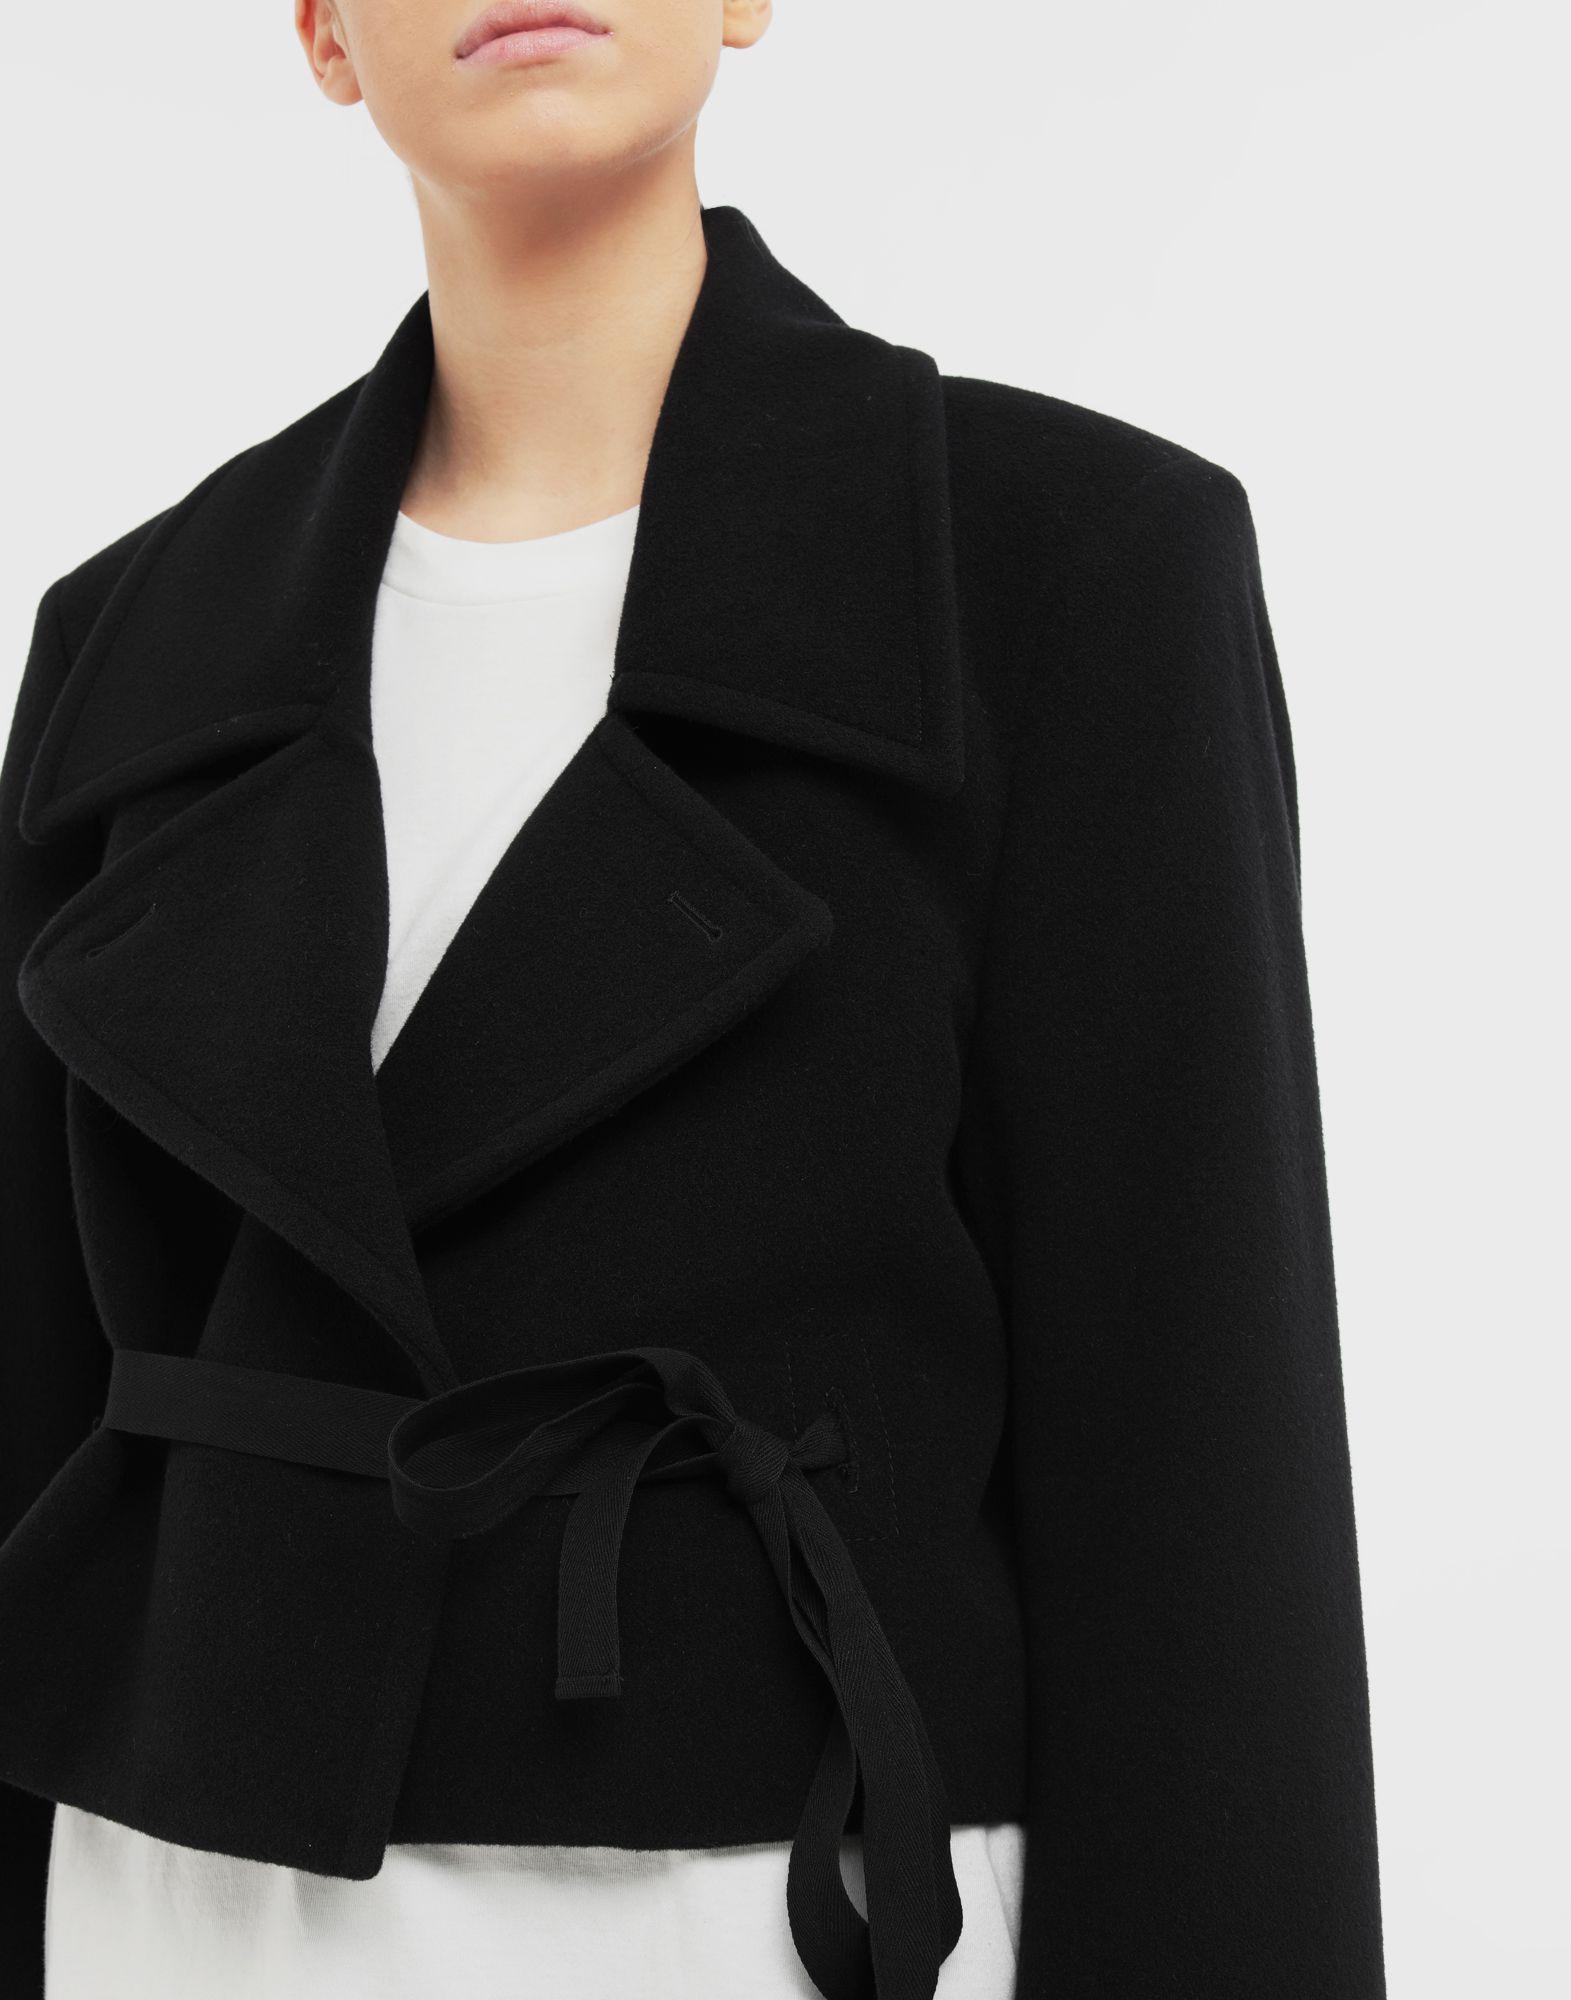 MM6 MAISON MARGIELA Jacket with strings Jacket Woman a